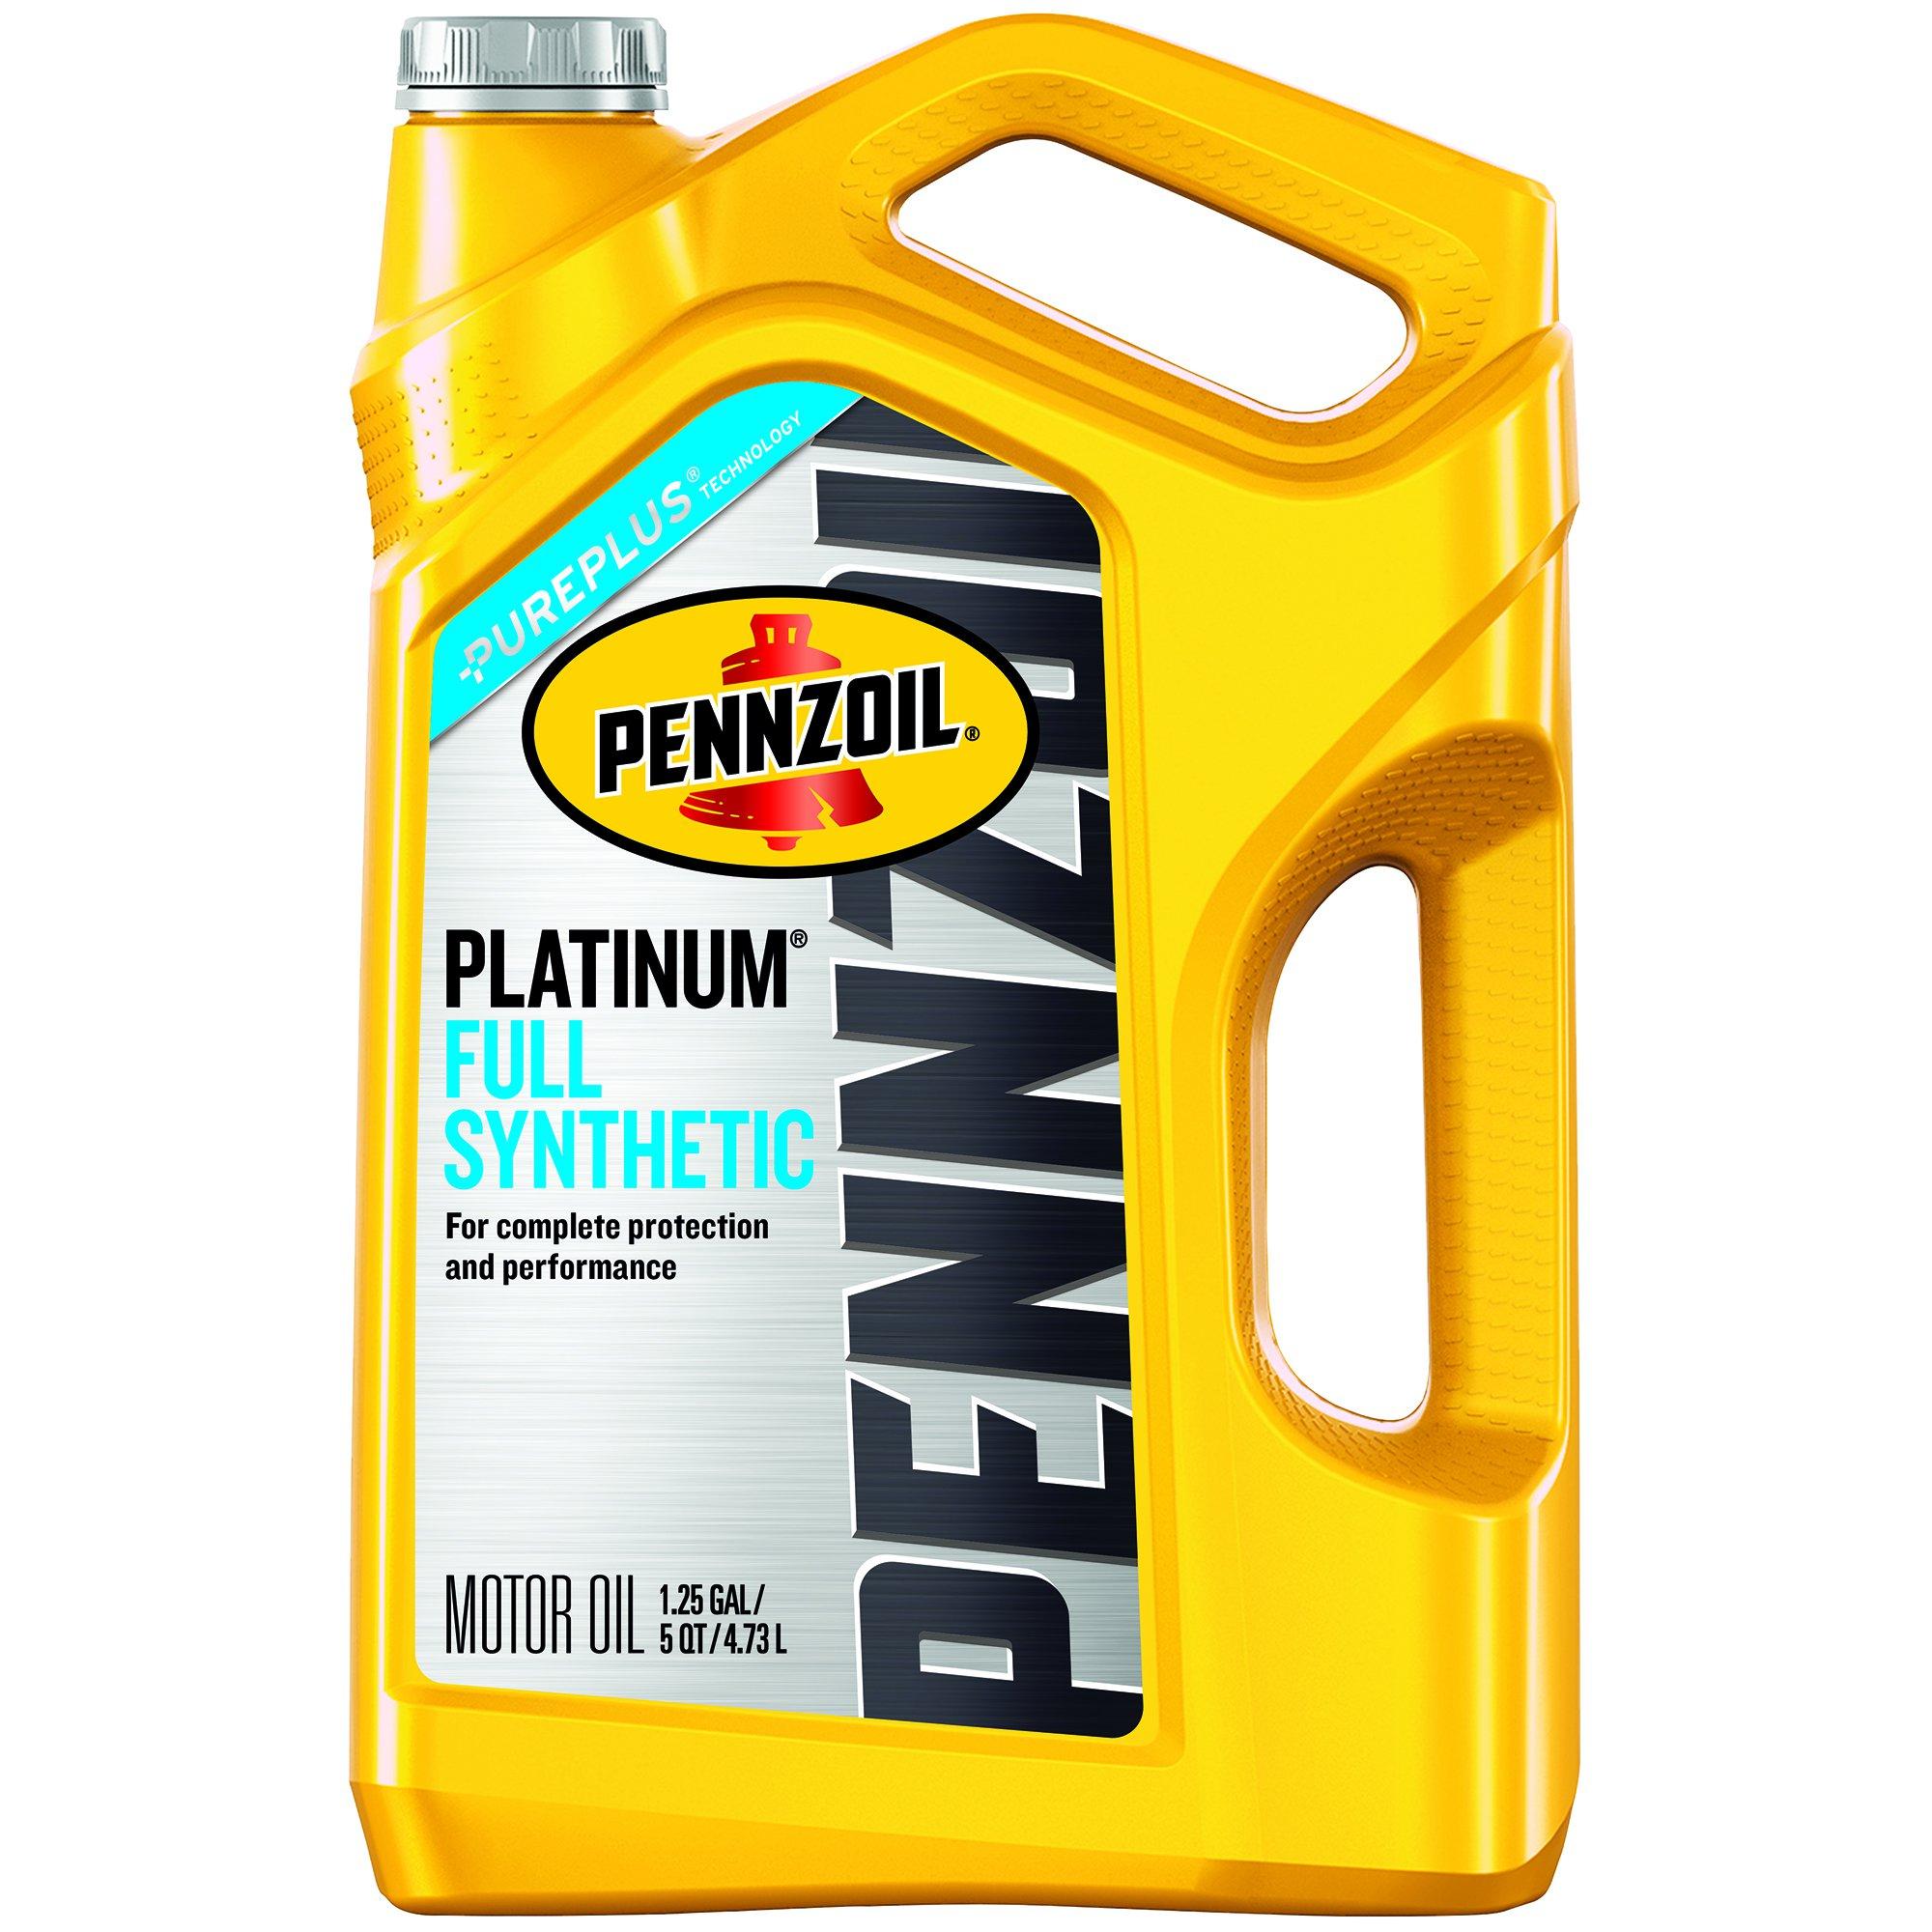 'Pennzoil4 Banner'